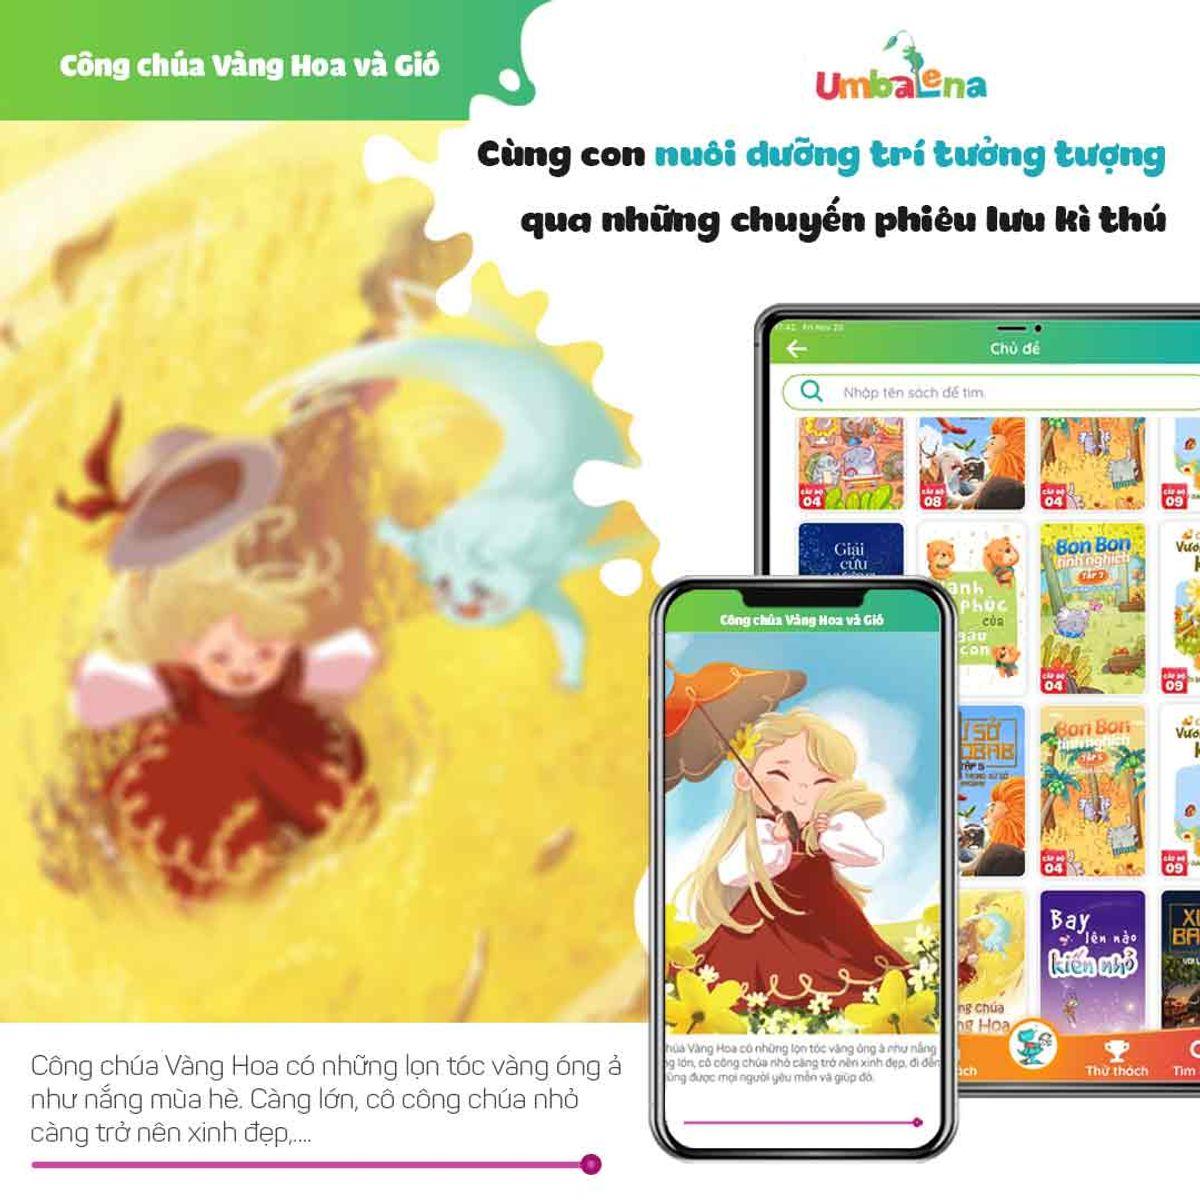 Voucher Gói Việt Anh 5 năm - Umbalena